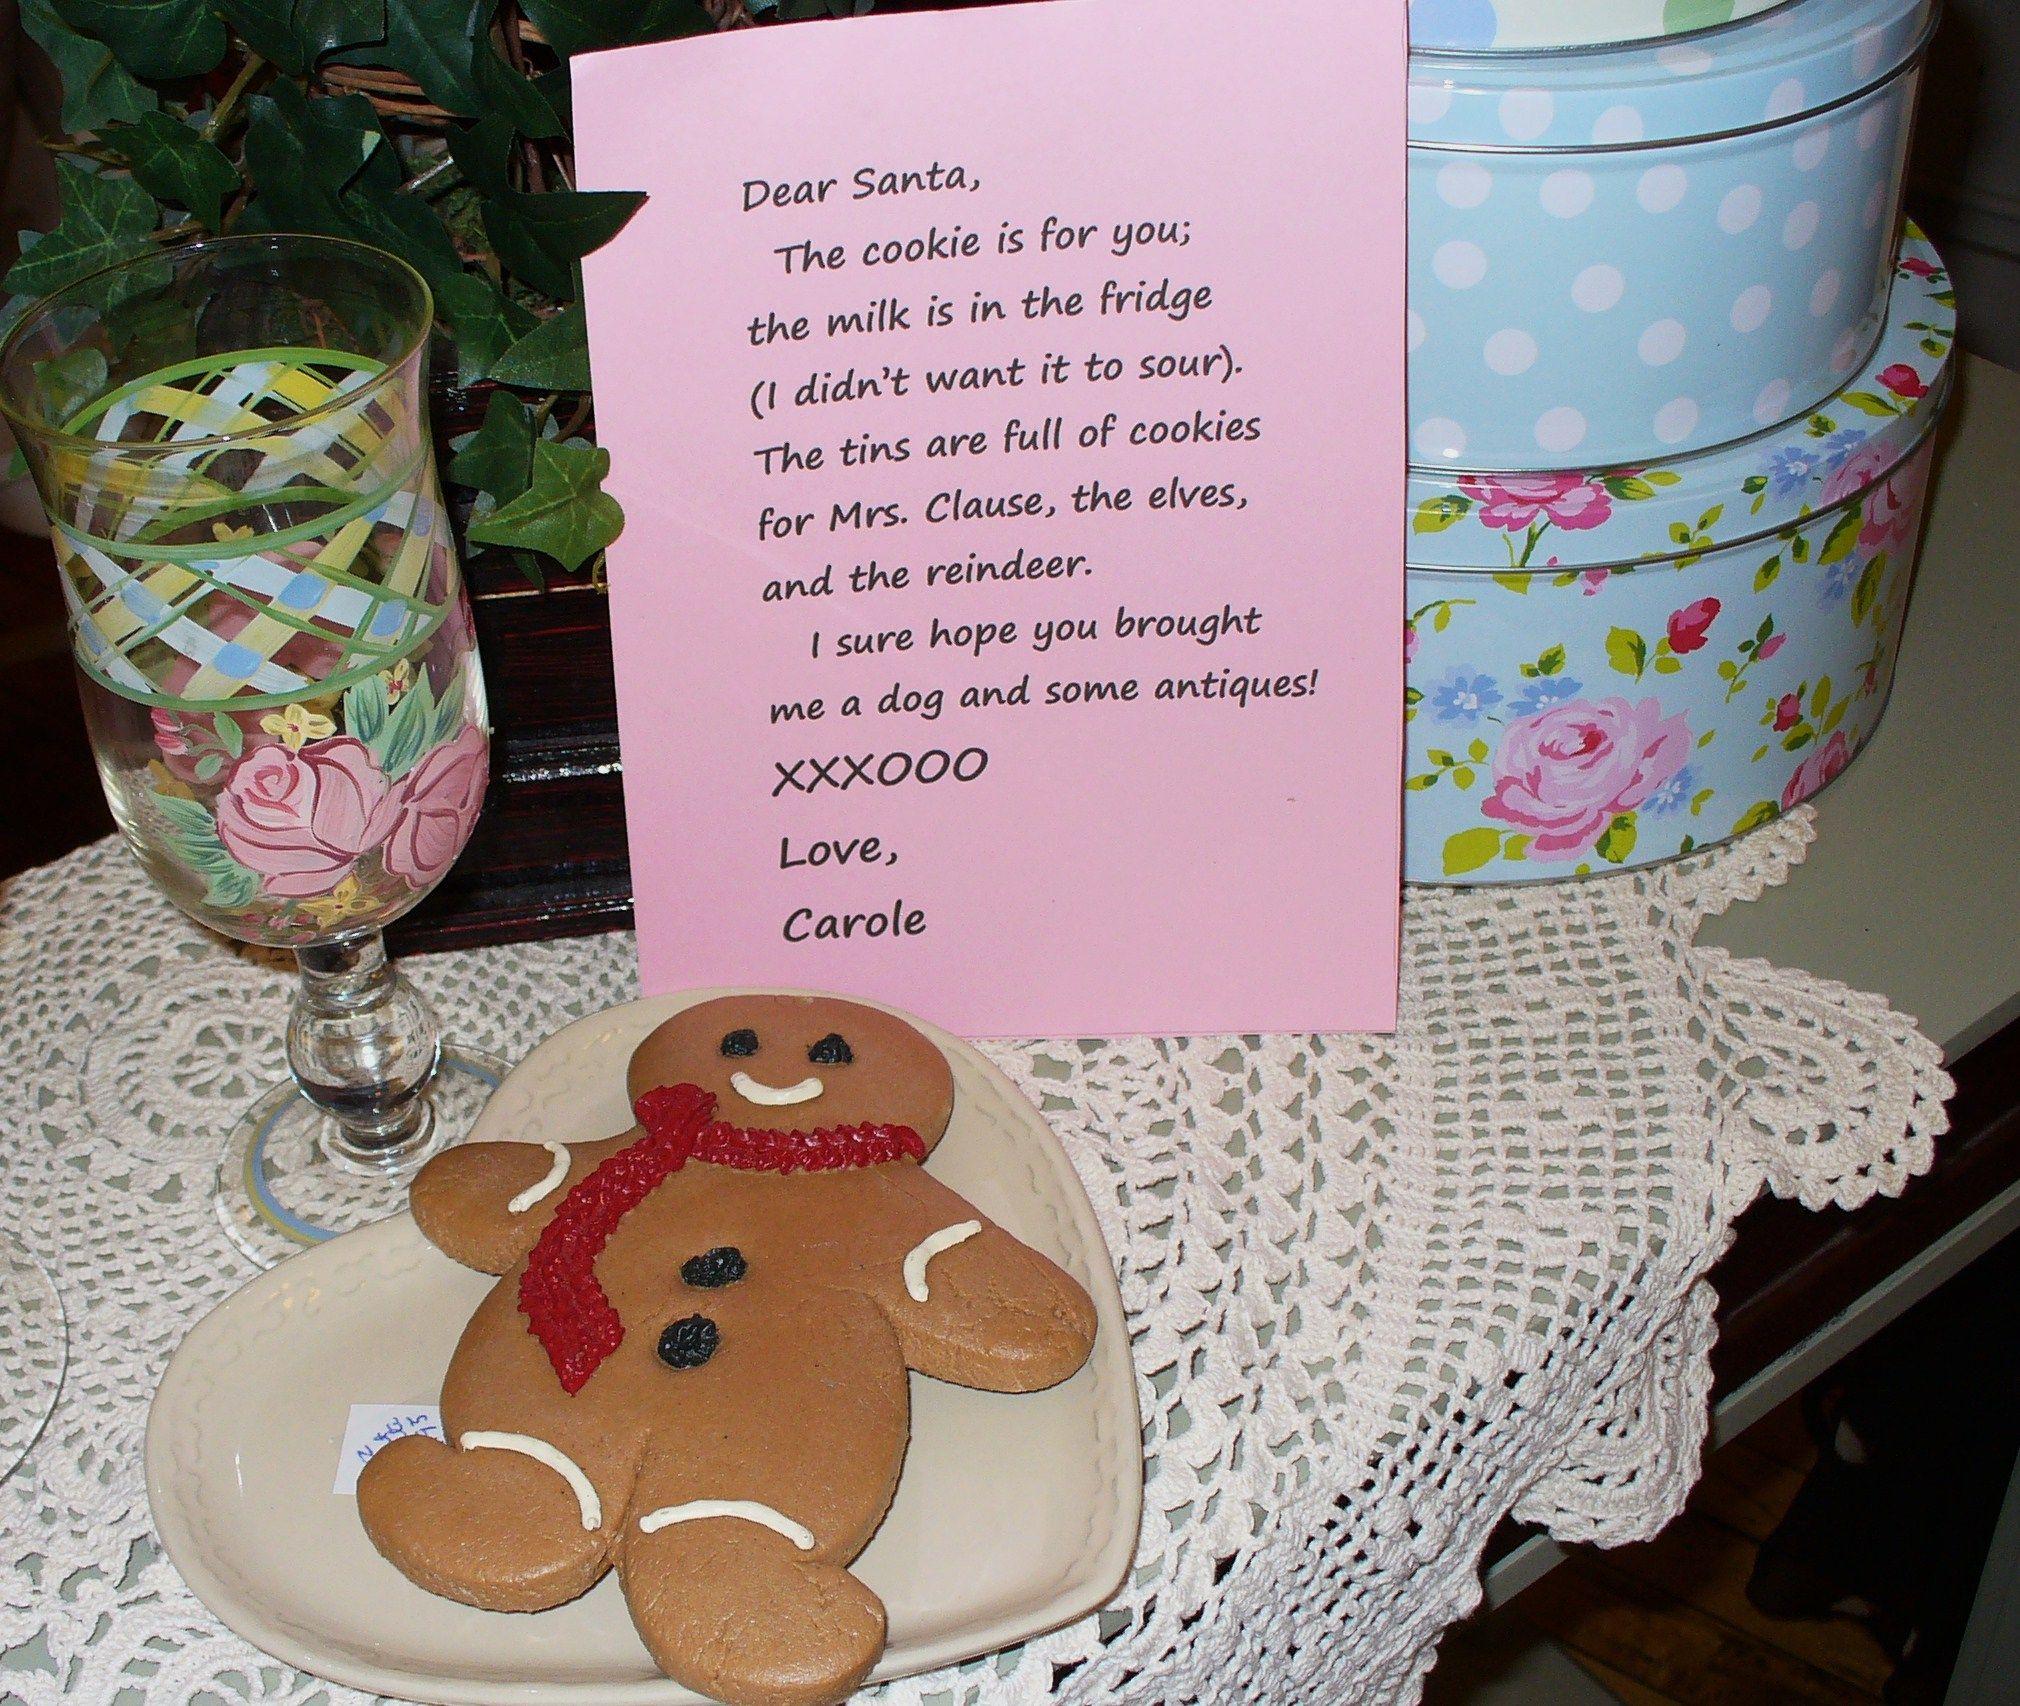 Letter to Santa. Santa letter, Dear santa, The elf